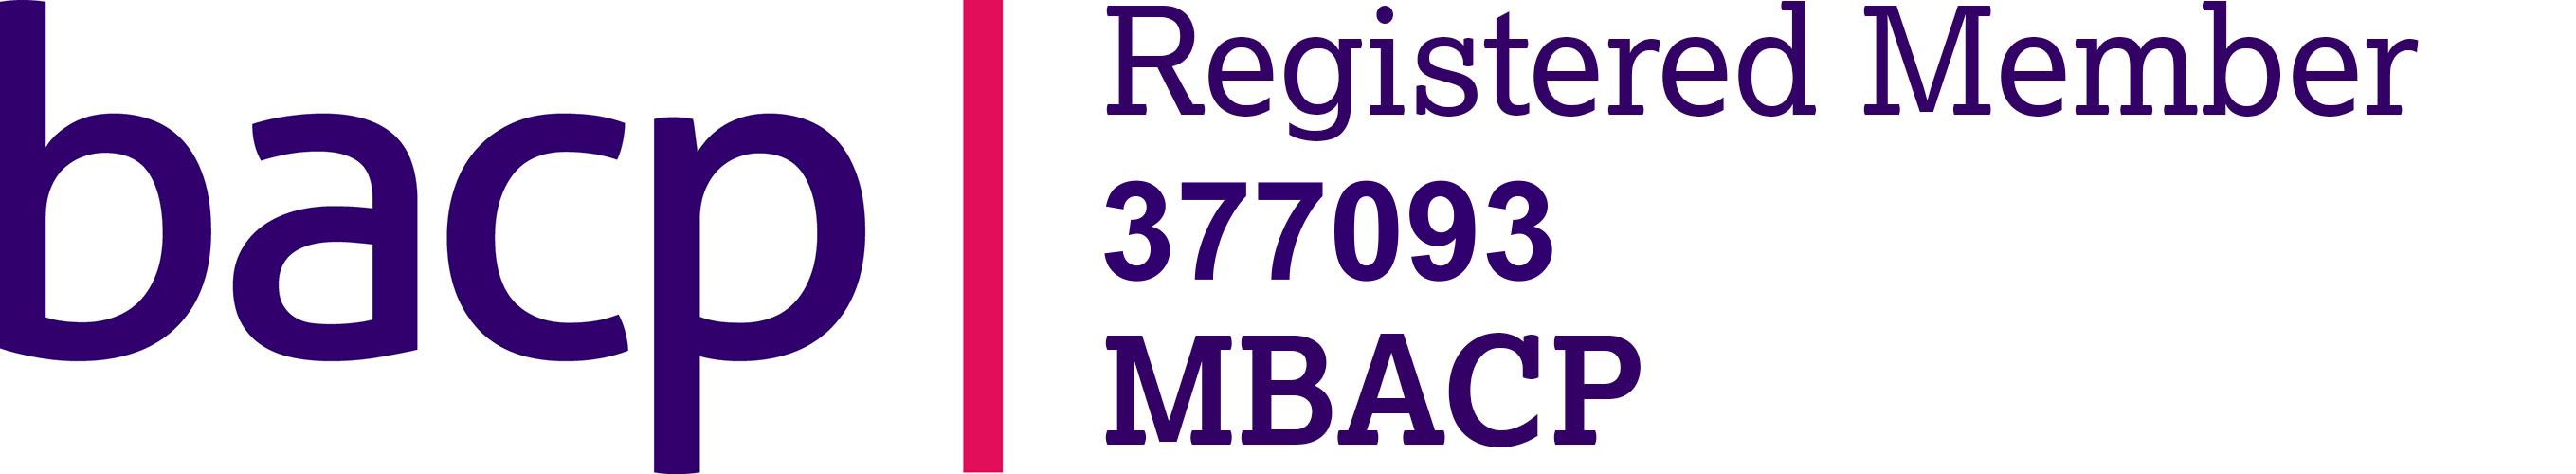 BACP Logo - 377093